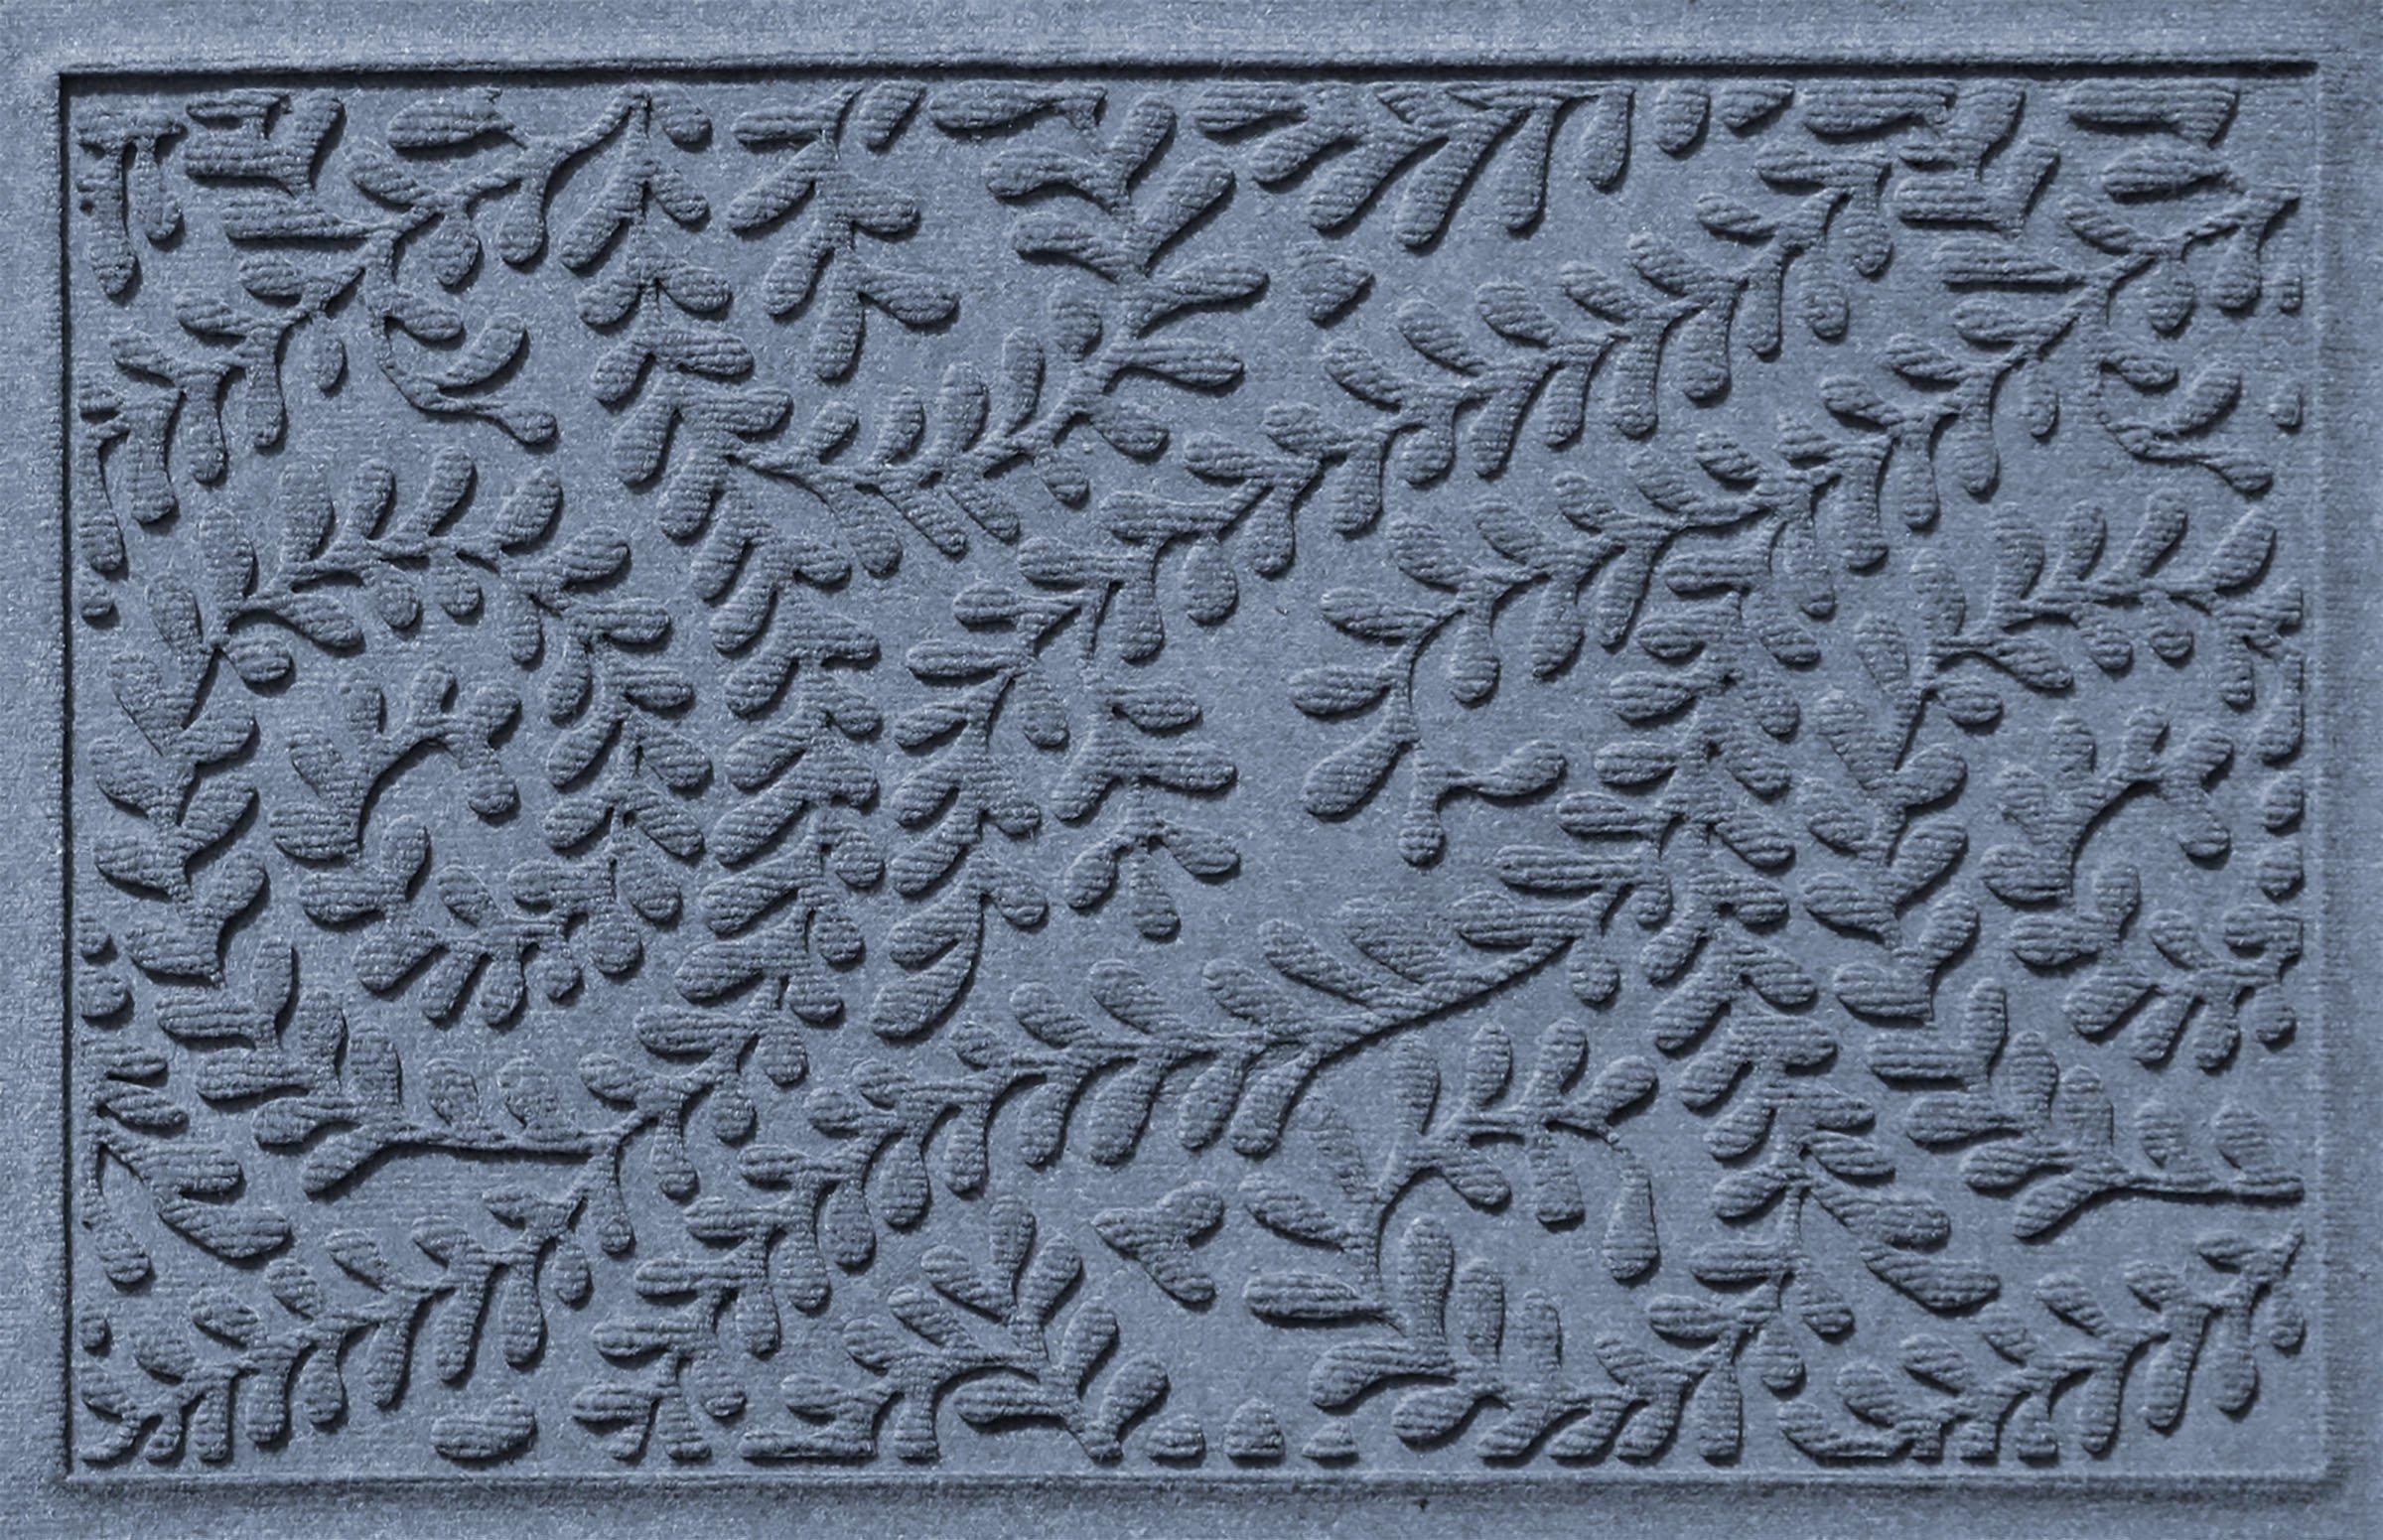 Bungalow Flooring Waterhog Doormat, 2' x 3', Skid Resistant, Easy to Clean, Catches Water and Debris, Boxwood Collection, Bluestone